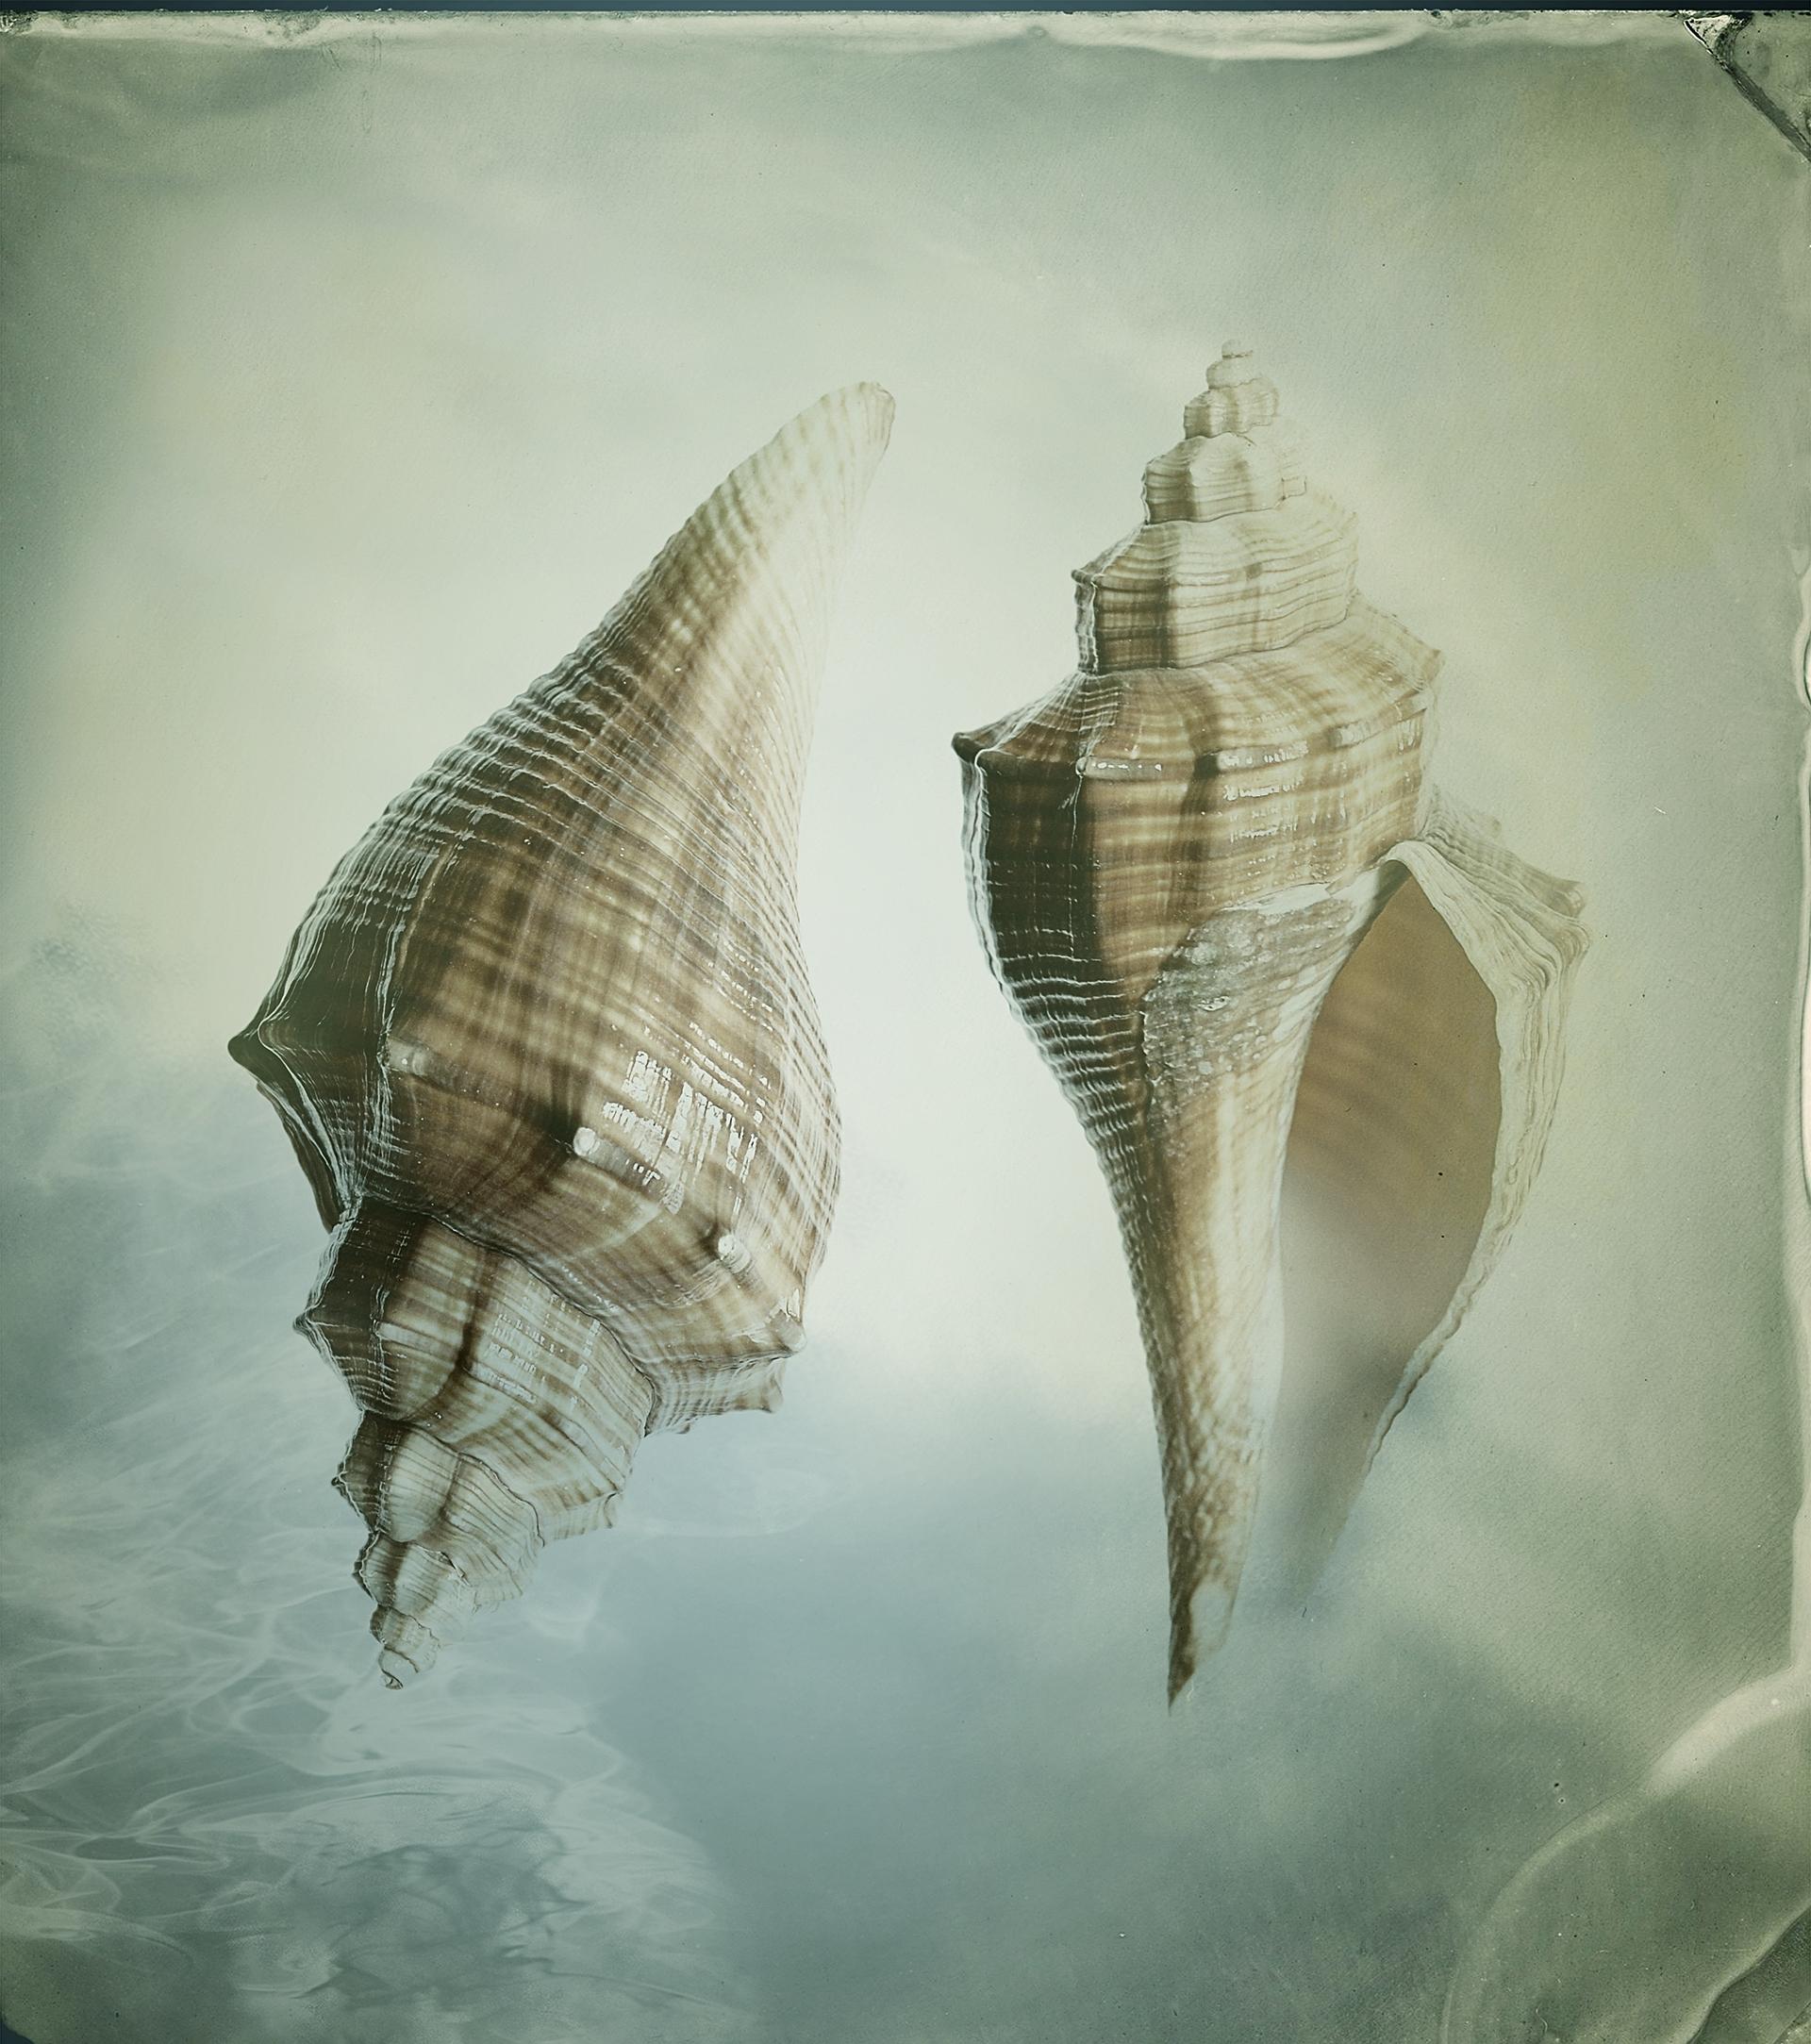 Shells / фотограф Bettina Güber